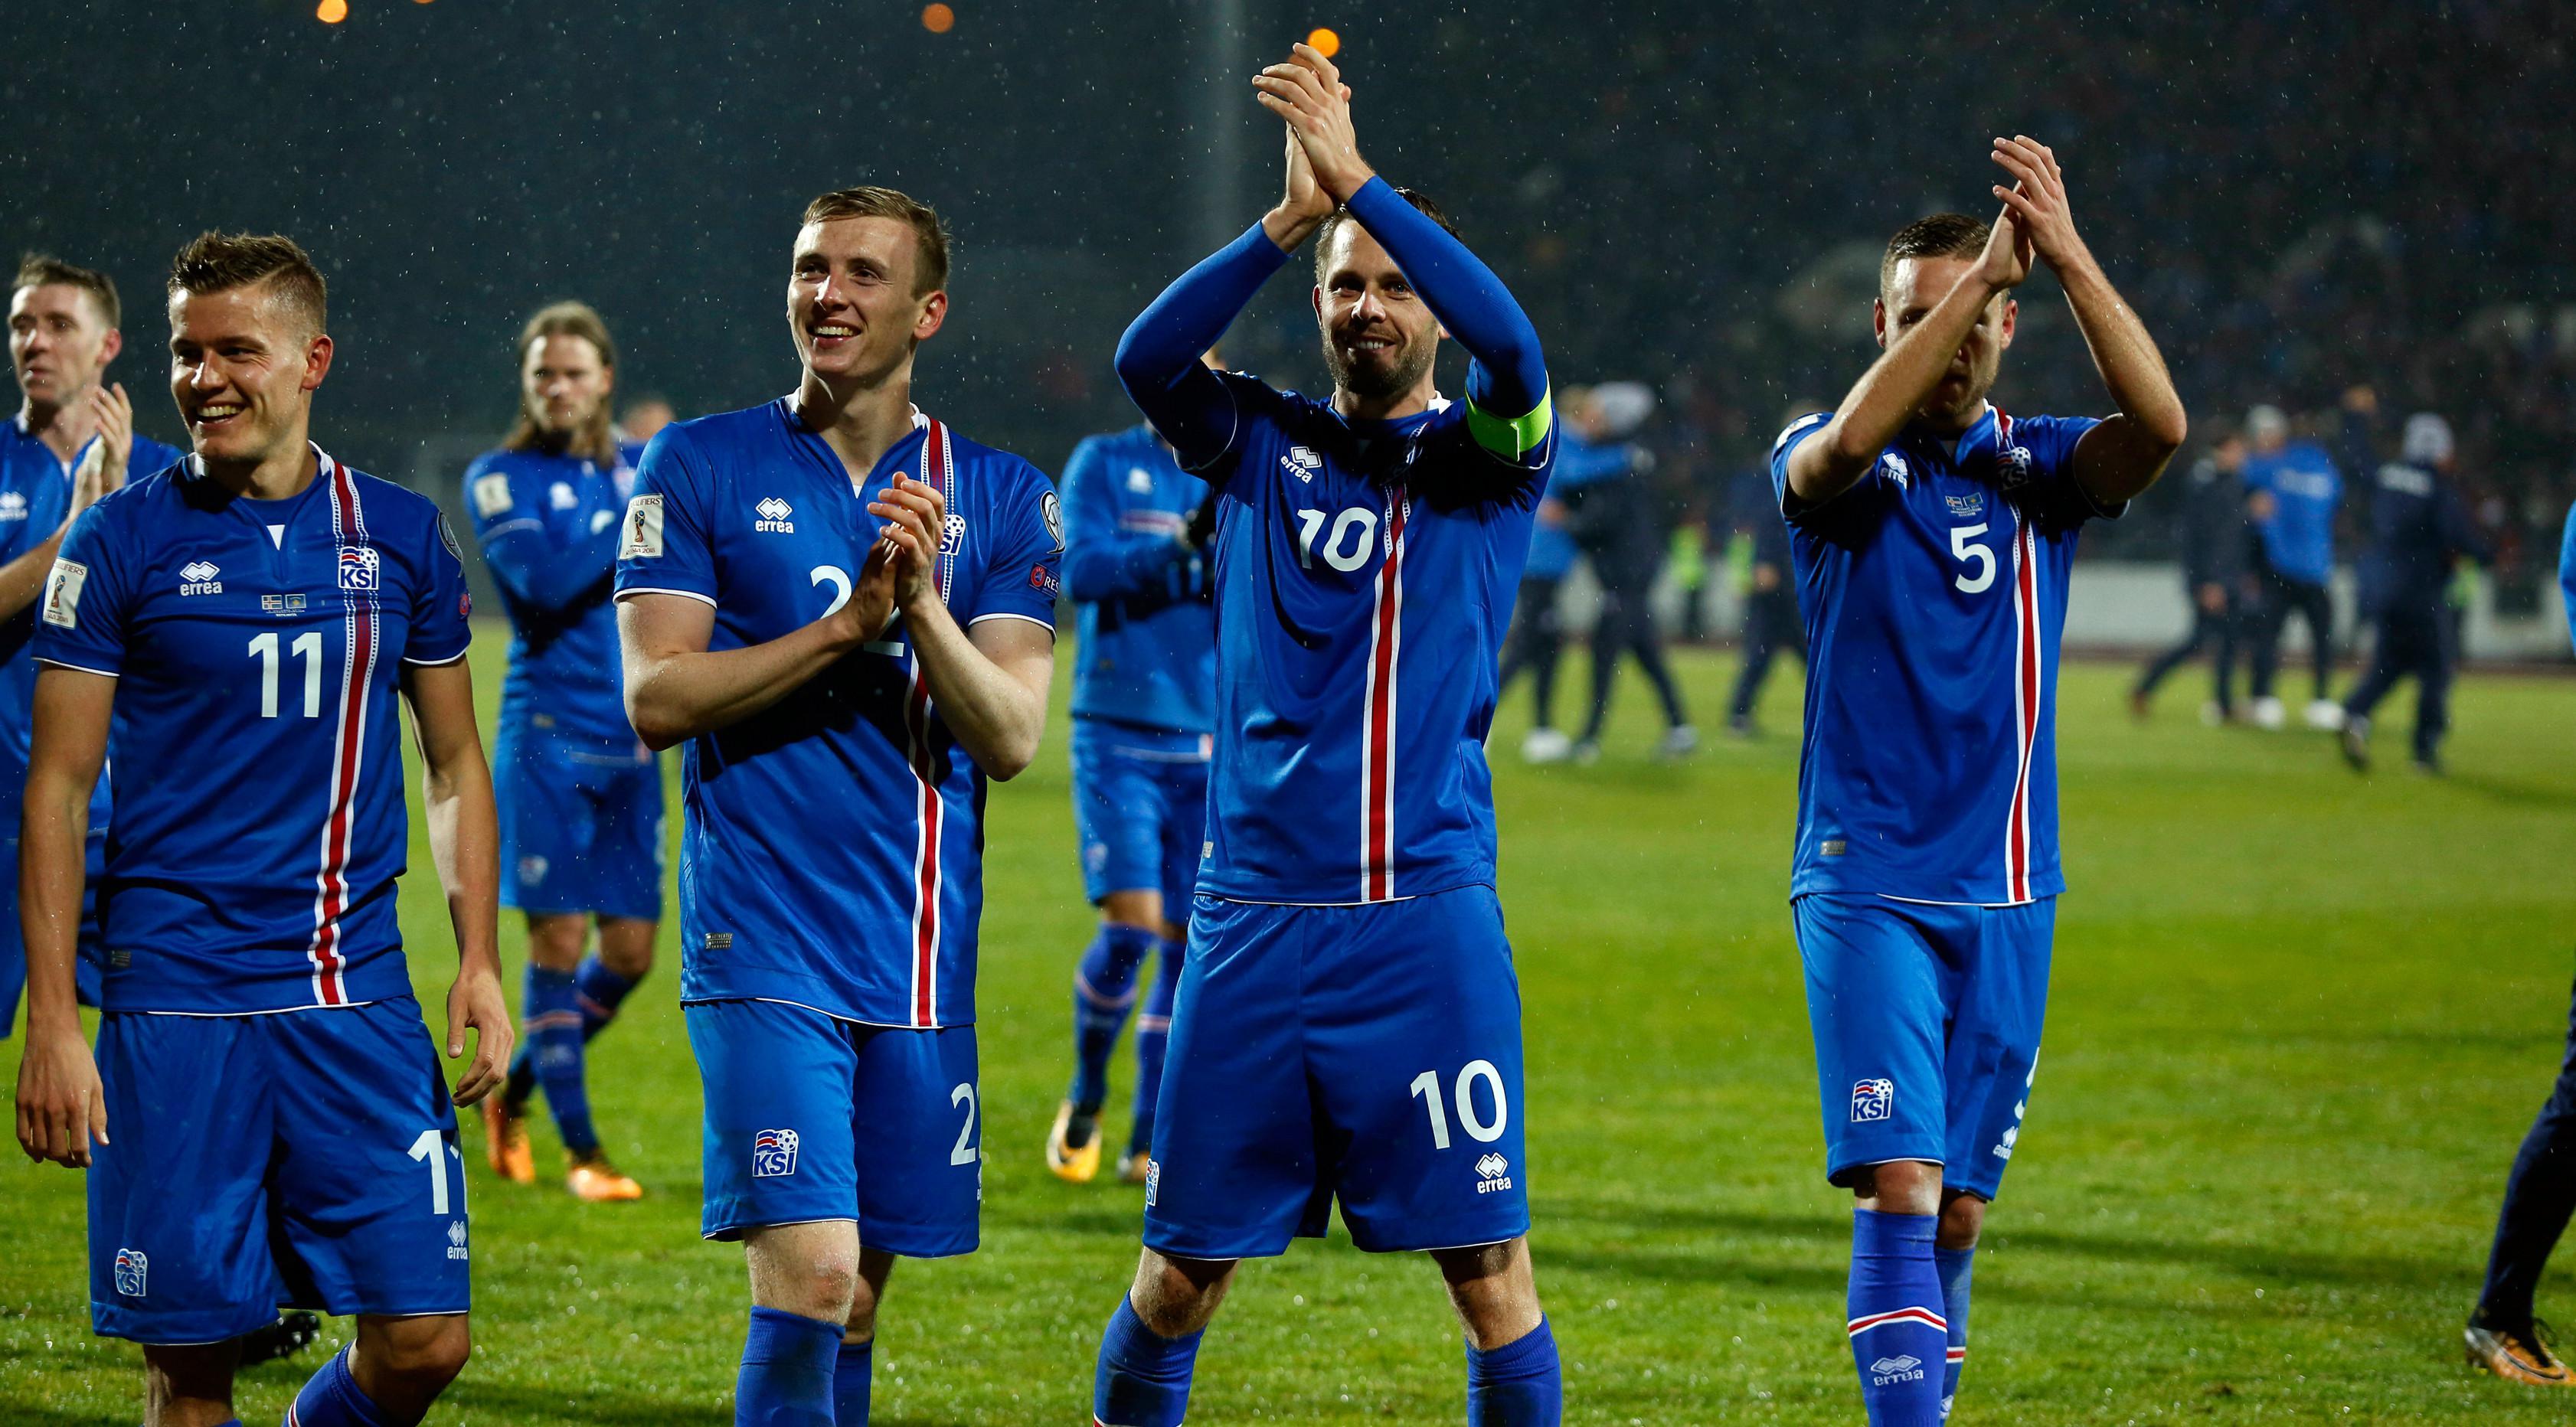 Pemain timnas Islandia bertepuk tangan usai laga Grup I Kualifikasi Piala Dunia 2018 melawan Kosovo di Laugardalsvollur, Senin (9/10). Islandia mencatat sejarah sebagai negara terkecil yang lolos ke Piala Dunia setelah menang 2-0. (AP/Brynjar Gunnarsson)